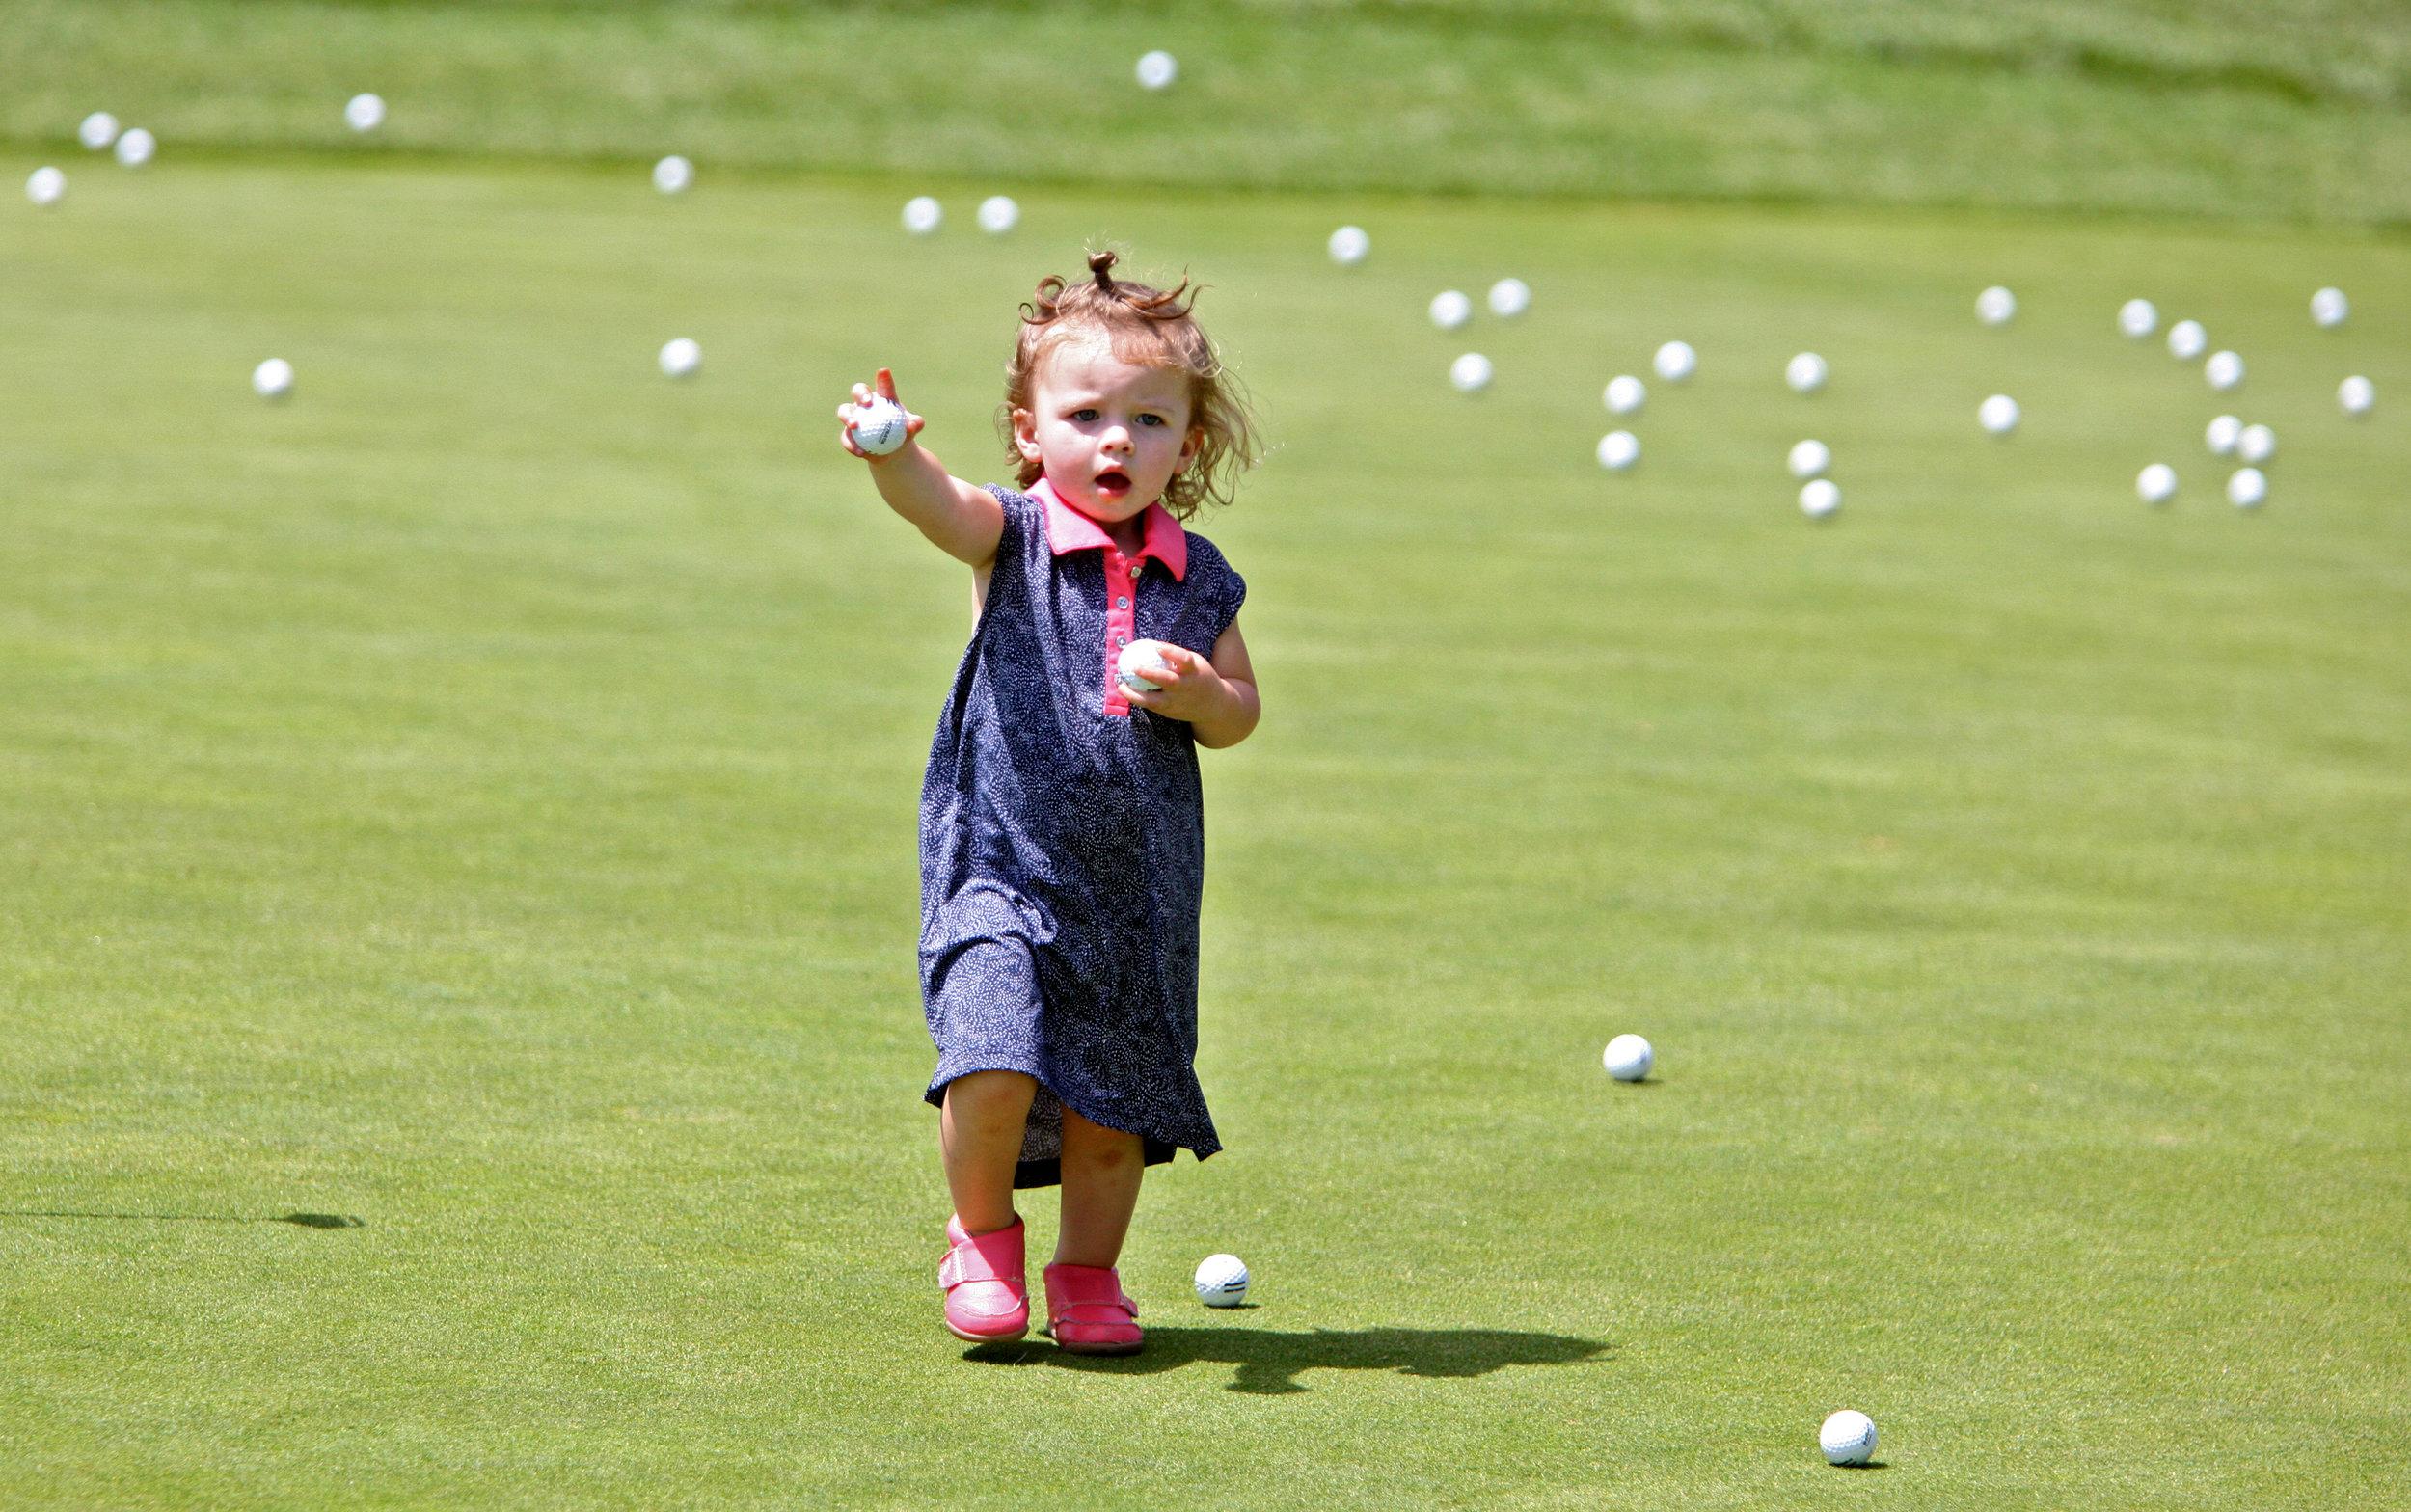 2017_Walk_With_Me_Golf_0051.JPG